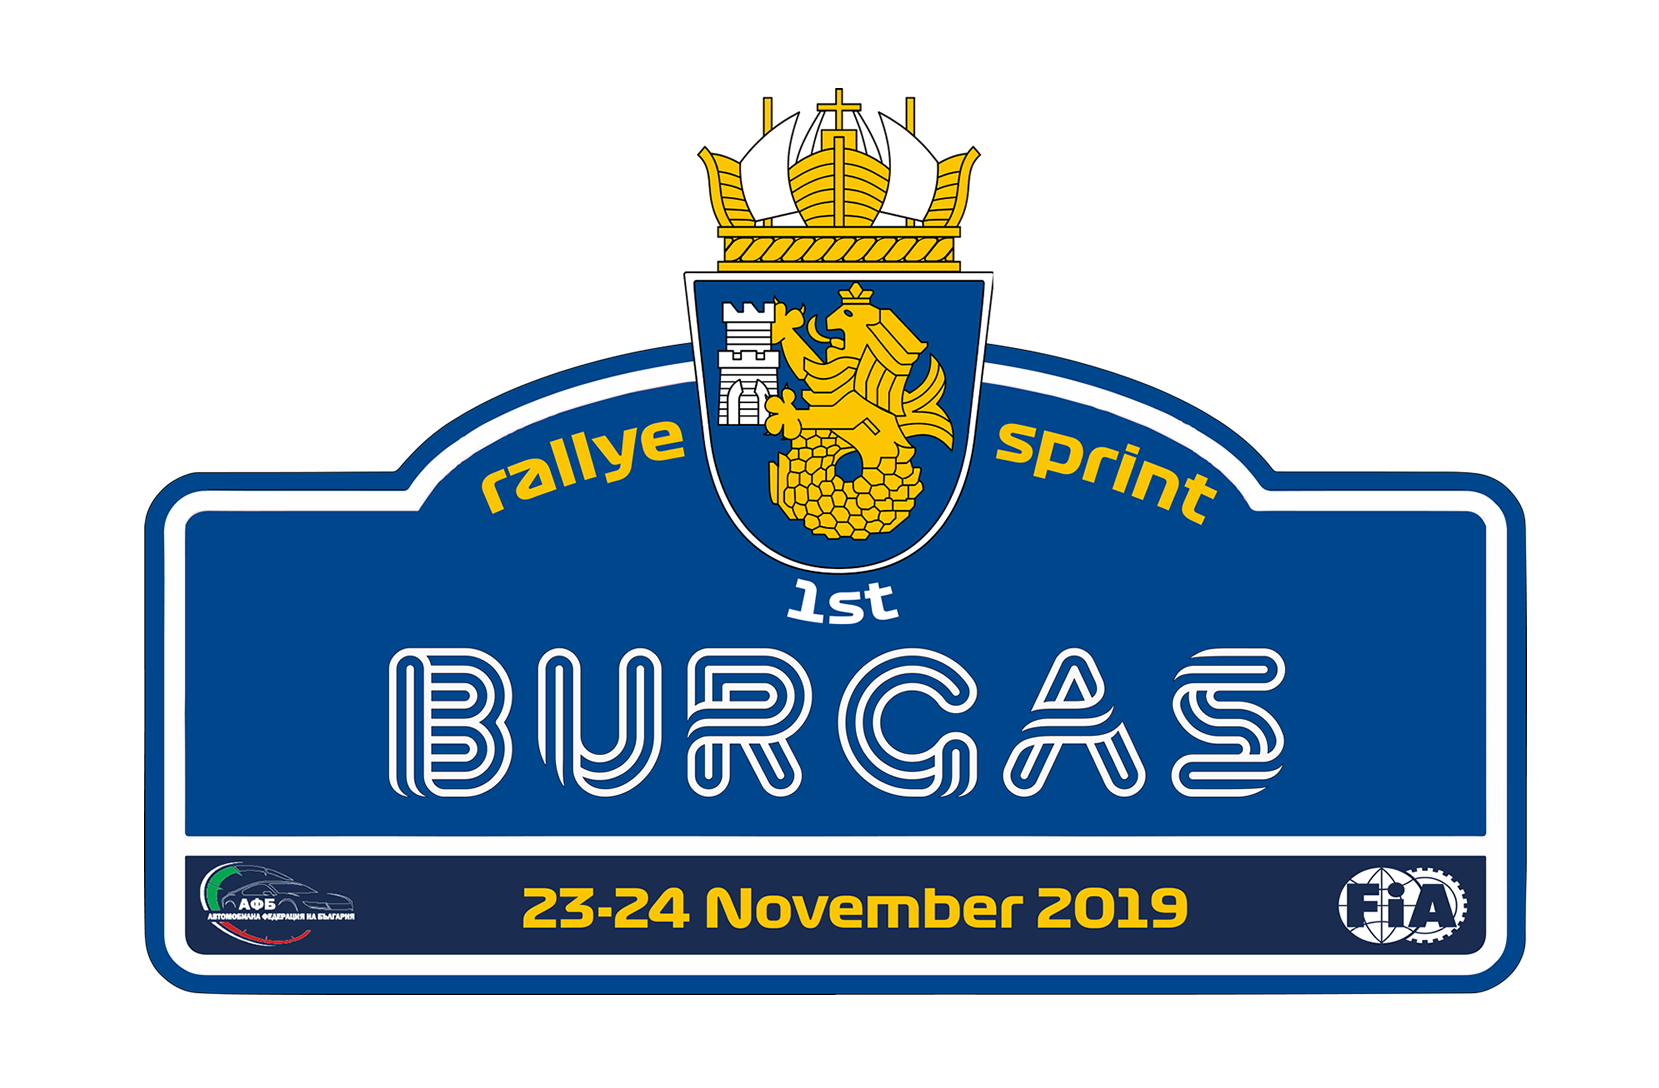 rallysprint burgas logo web